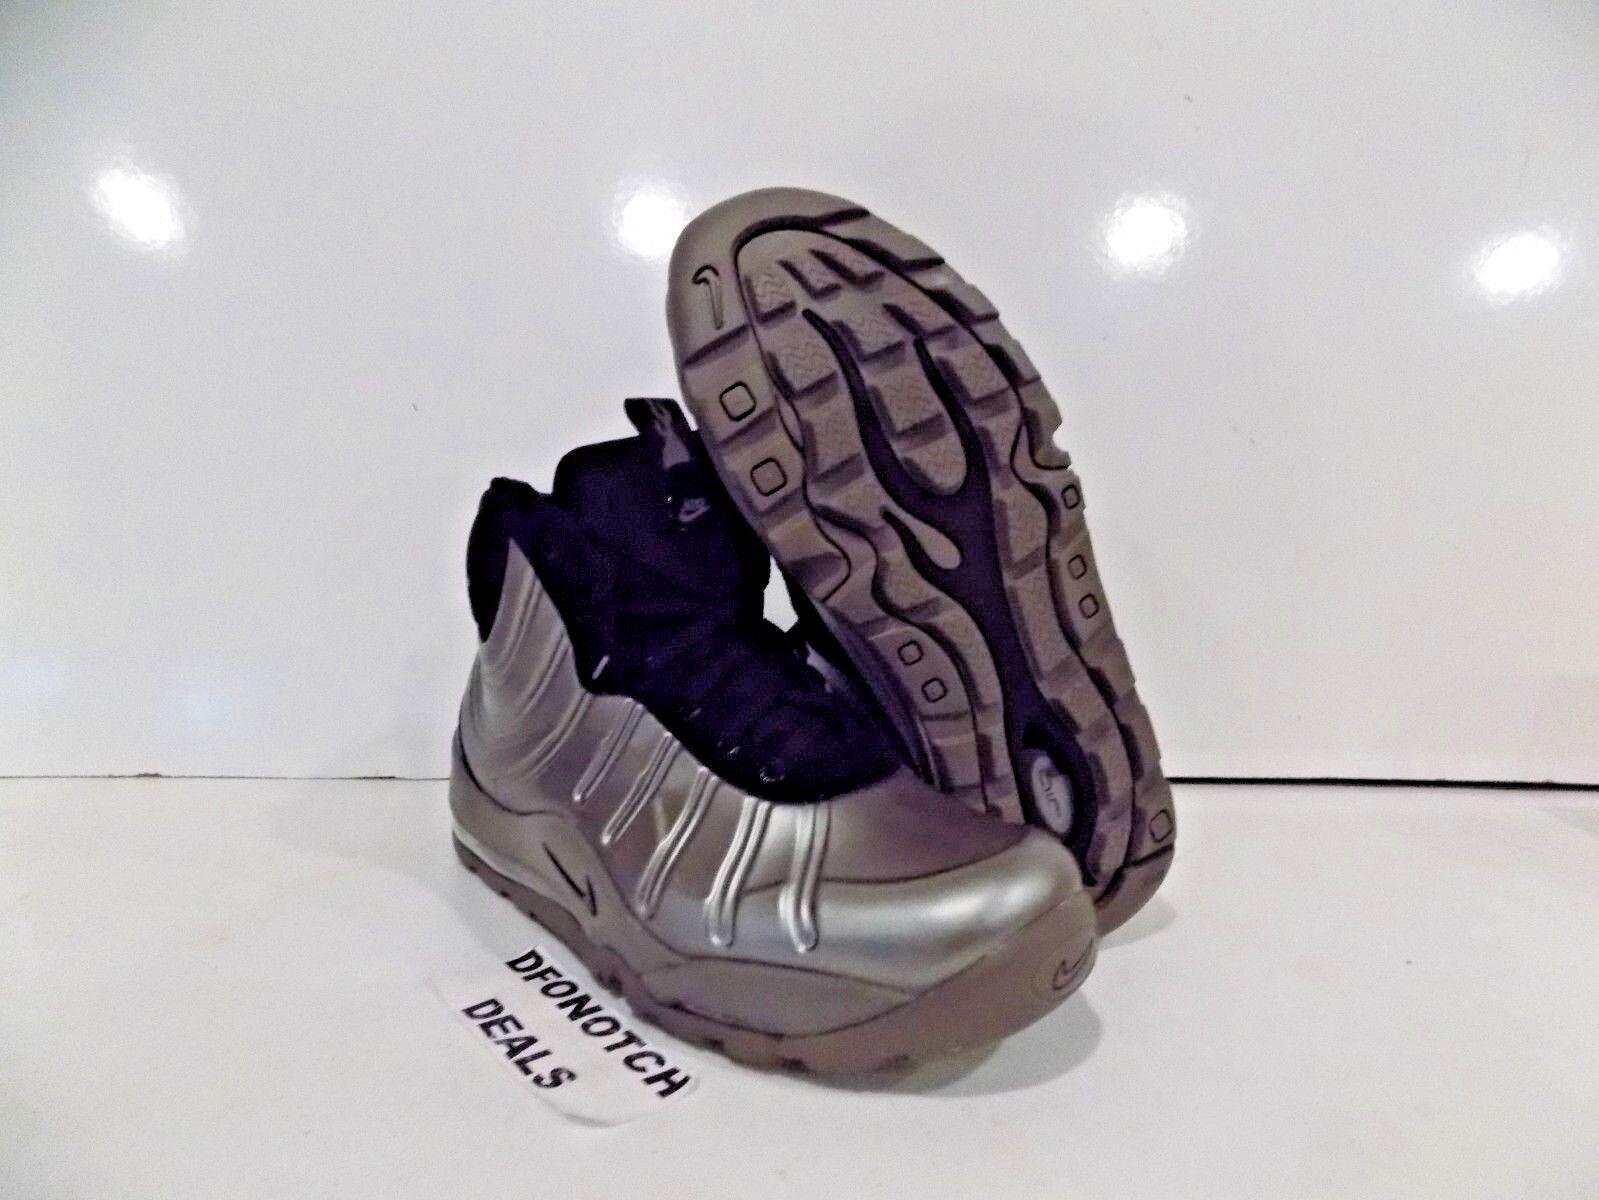 Nike Air Bakin' Posite Men's Sz 8.5-10.5 Silver Black 618056 002 NEW MSRP  225